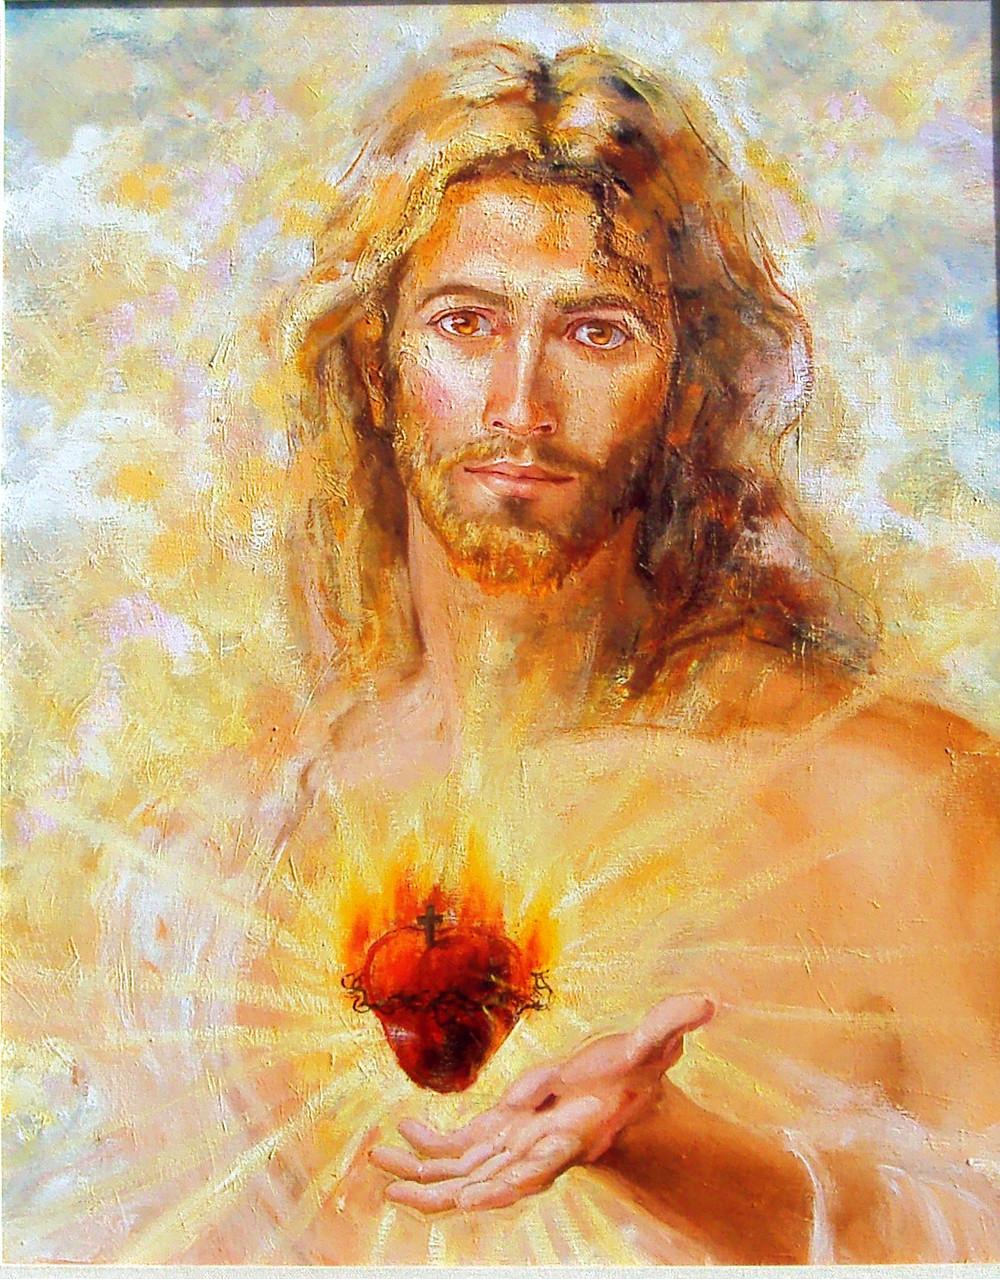 Jesus Cristo - Sagrado Masculino (Autor Desconhecido por mim)